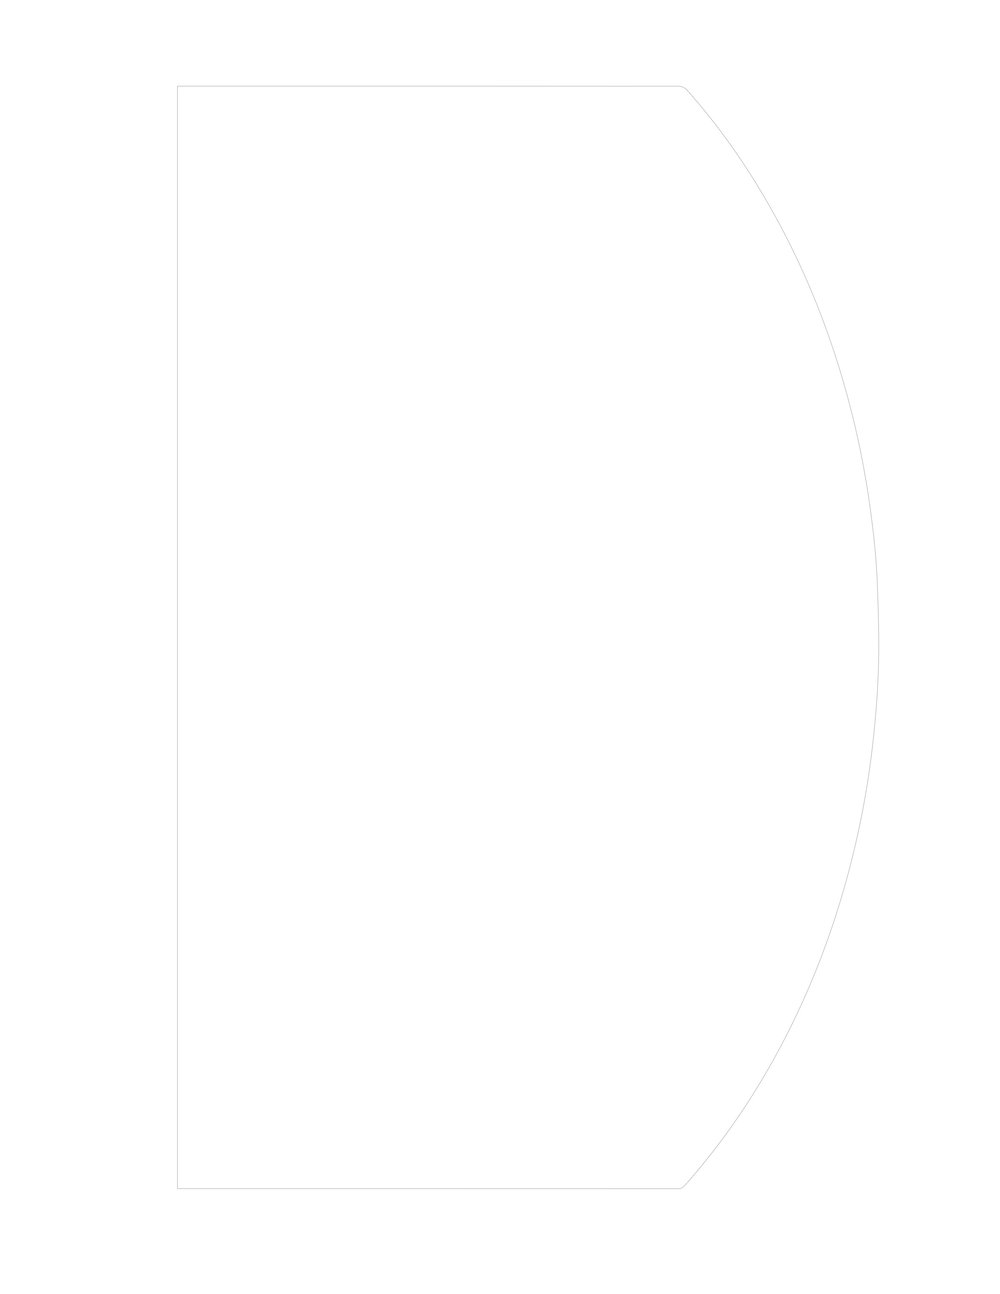 https://static1.squarespace.com/static/5148aa1de4b016fef442df9a/58115d5a03596e29c7dc6825/58115d5a9f7456709e60ea61/1477533164579/halloween+flyout+template+white.jpg?format=1000w